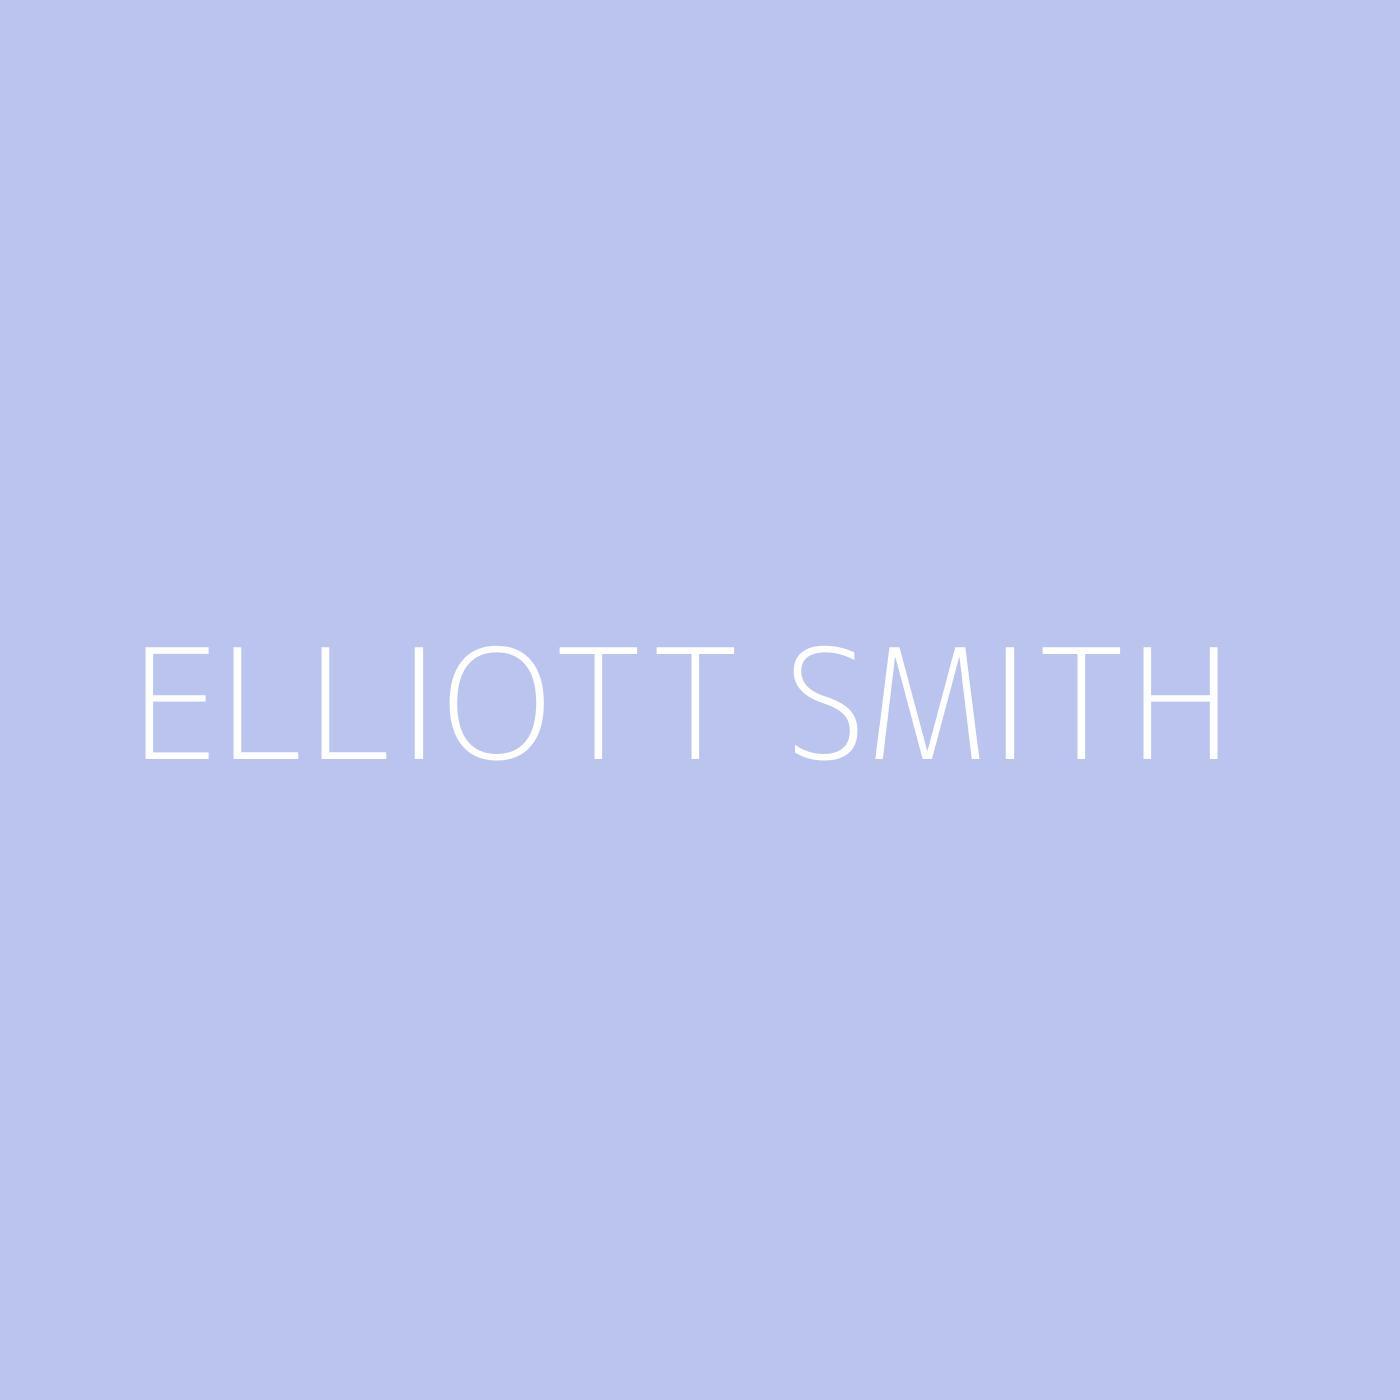 Elliott Smith Playlist Artwork